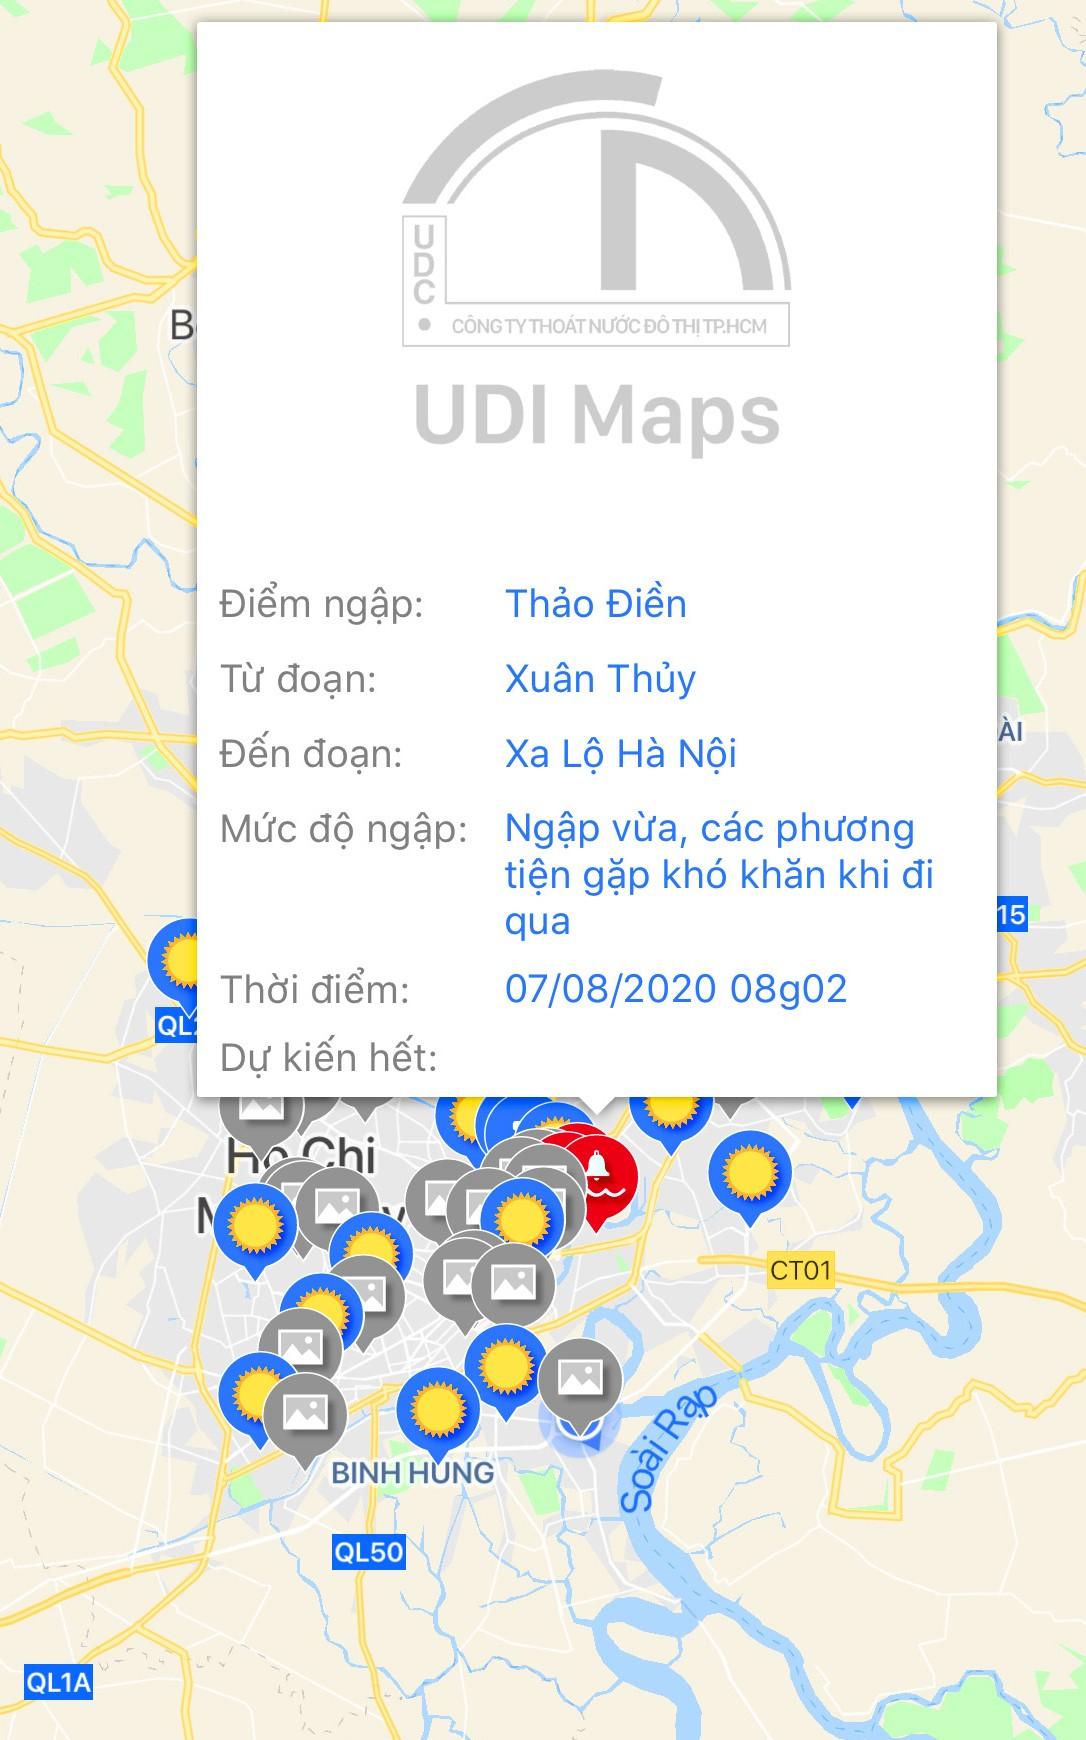 UDI MAPS - weather tracking app